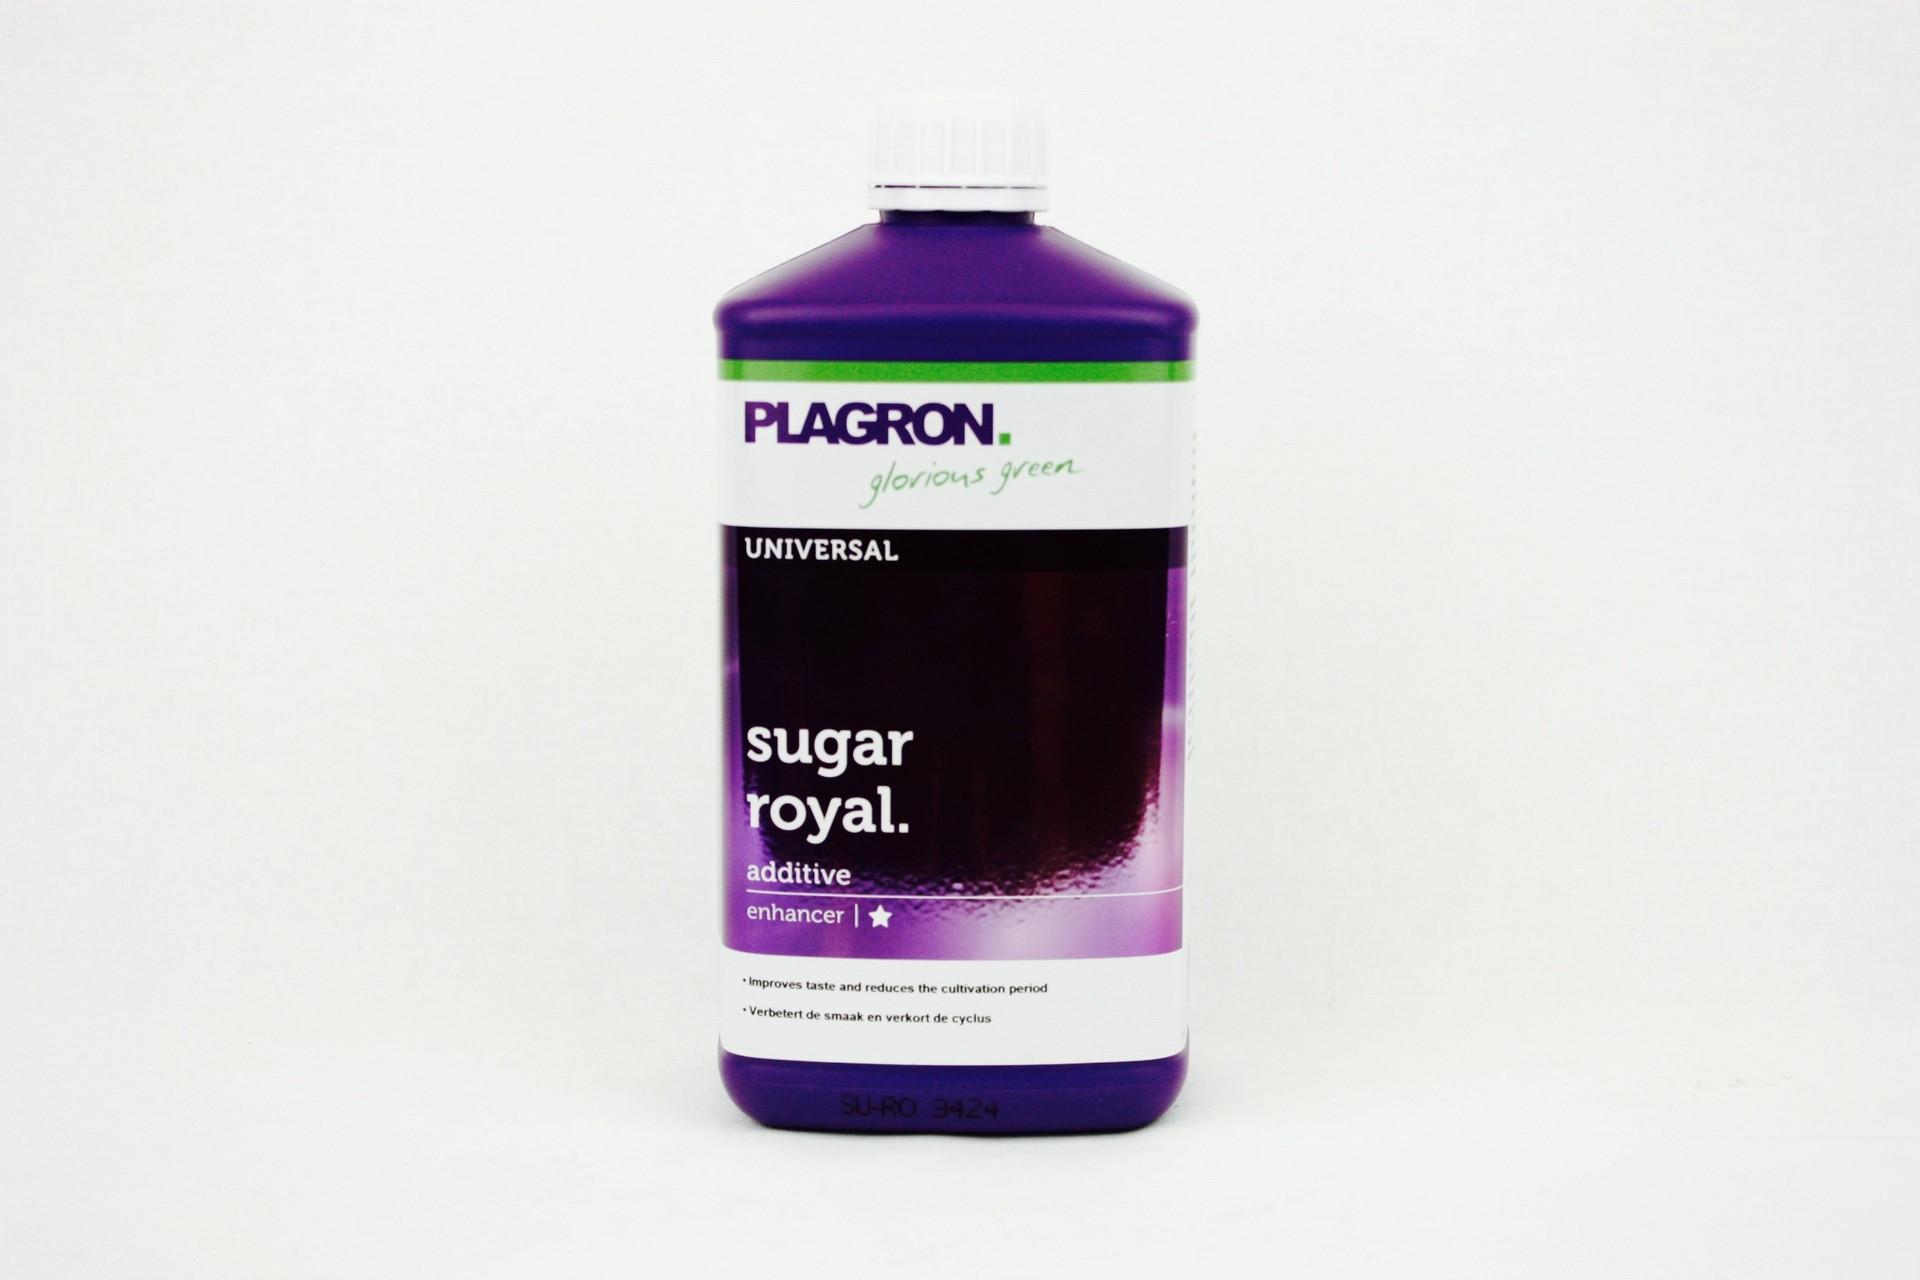 PLAGRON SUGAR ROYAL 1 LITRE